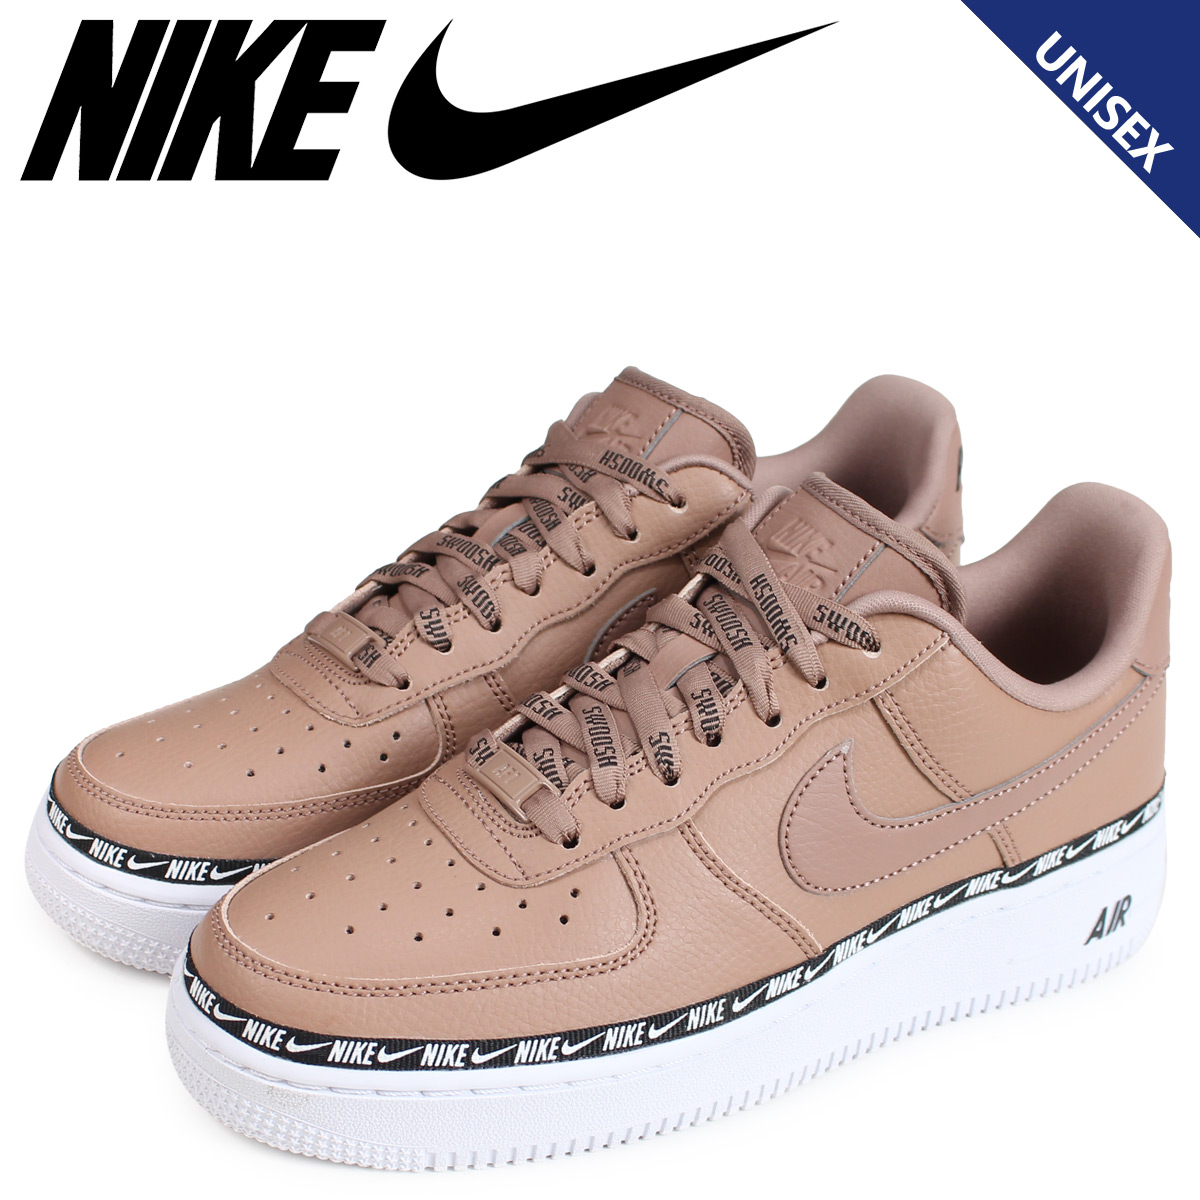 7887b3d2de [brand NIKE getting high popularity from sneakers freak]. Constant seller  model